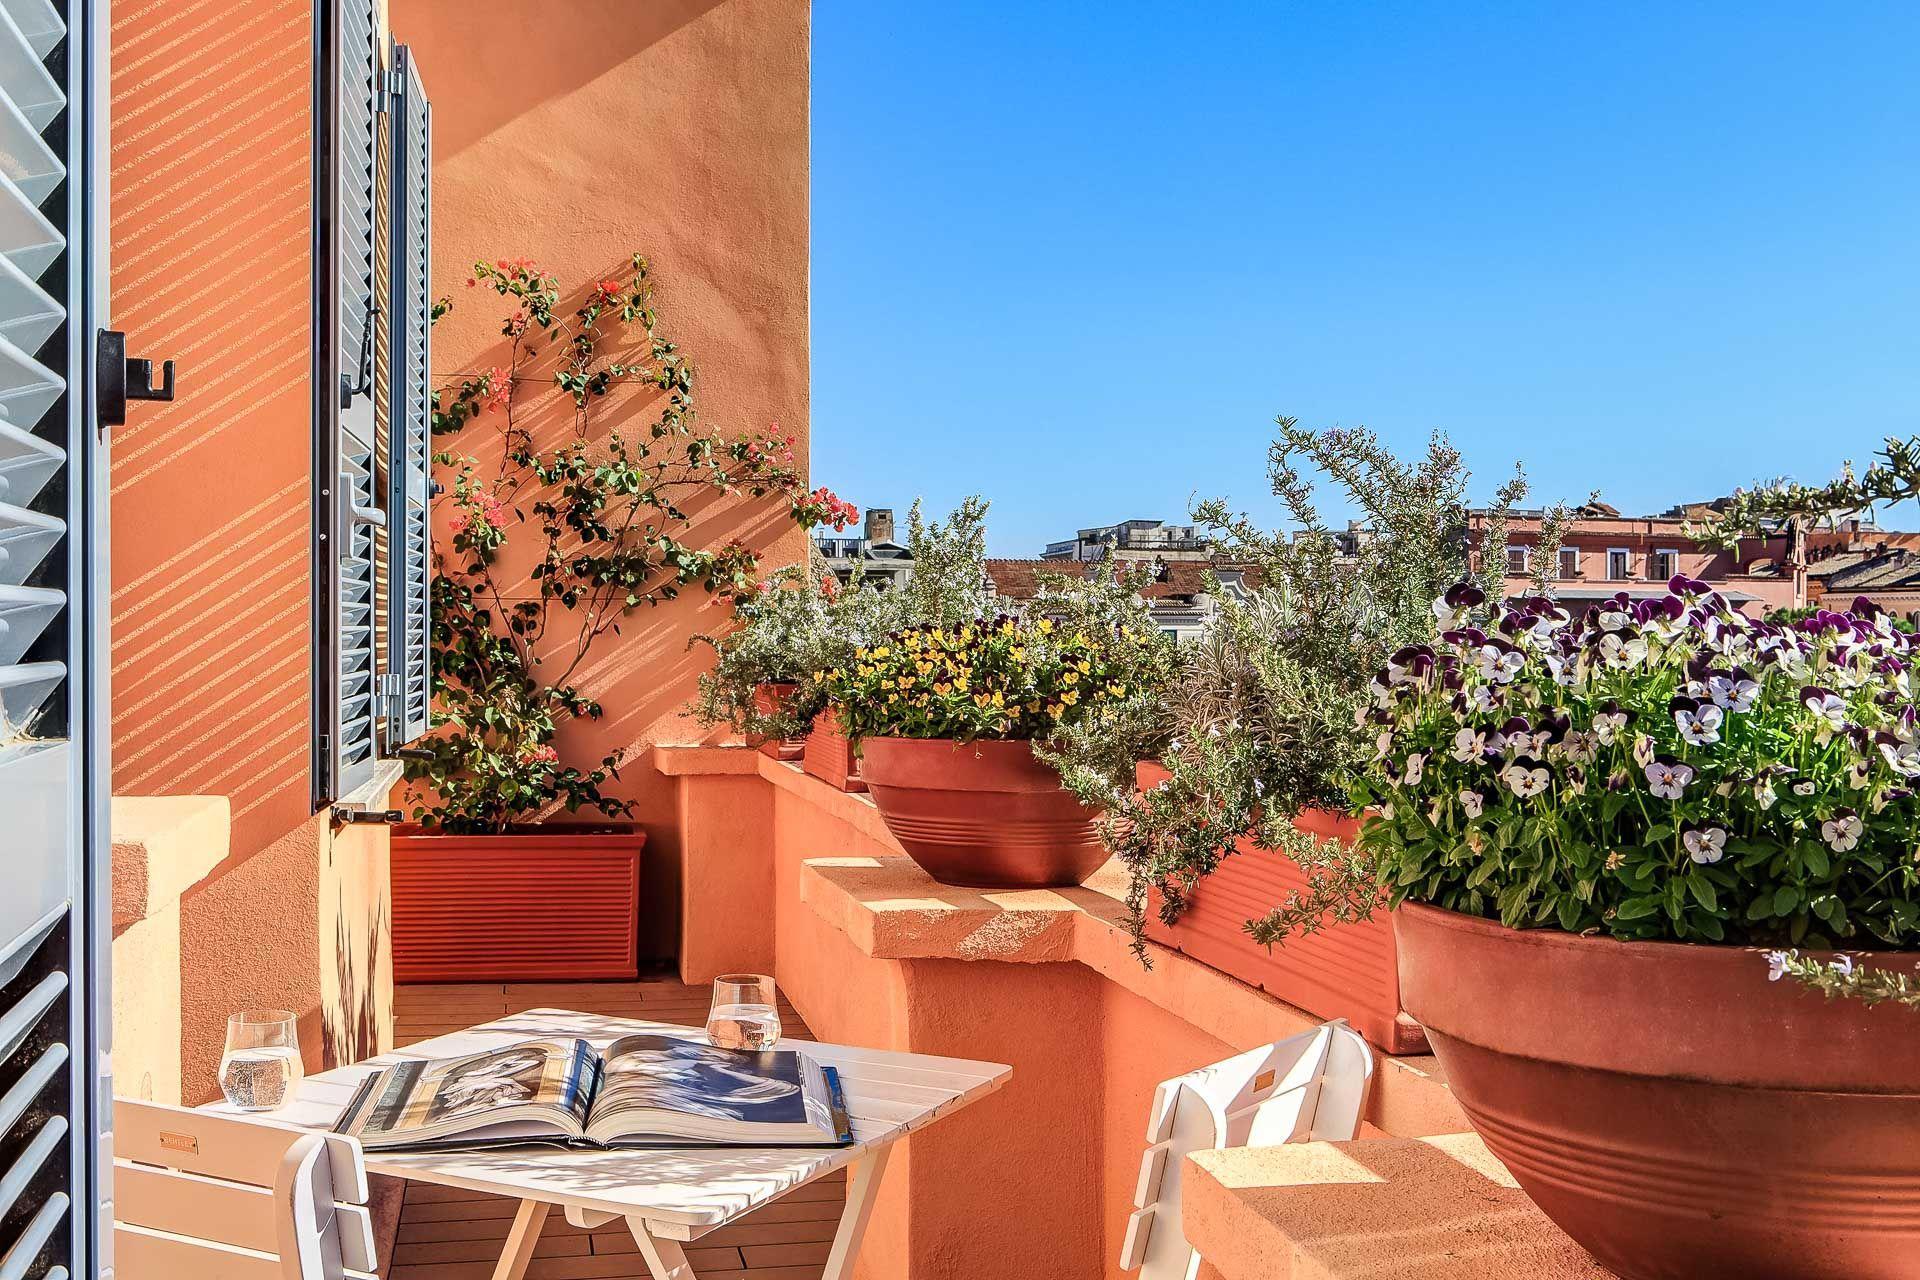 Roman Penthouse Luxury Retreats Accommodation In Rome Rome Bed Breakfast